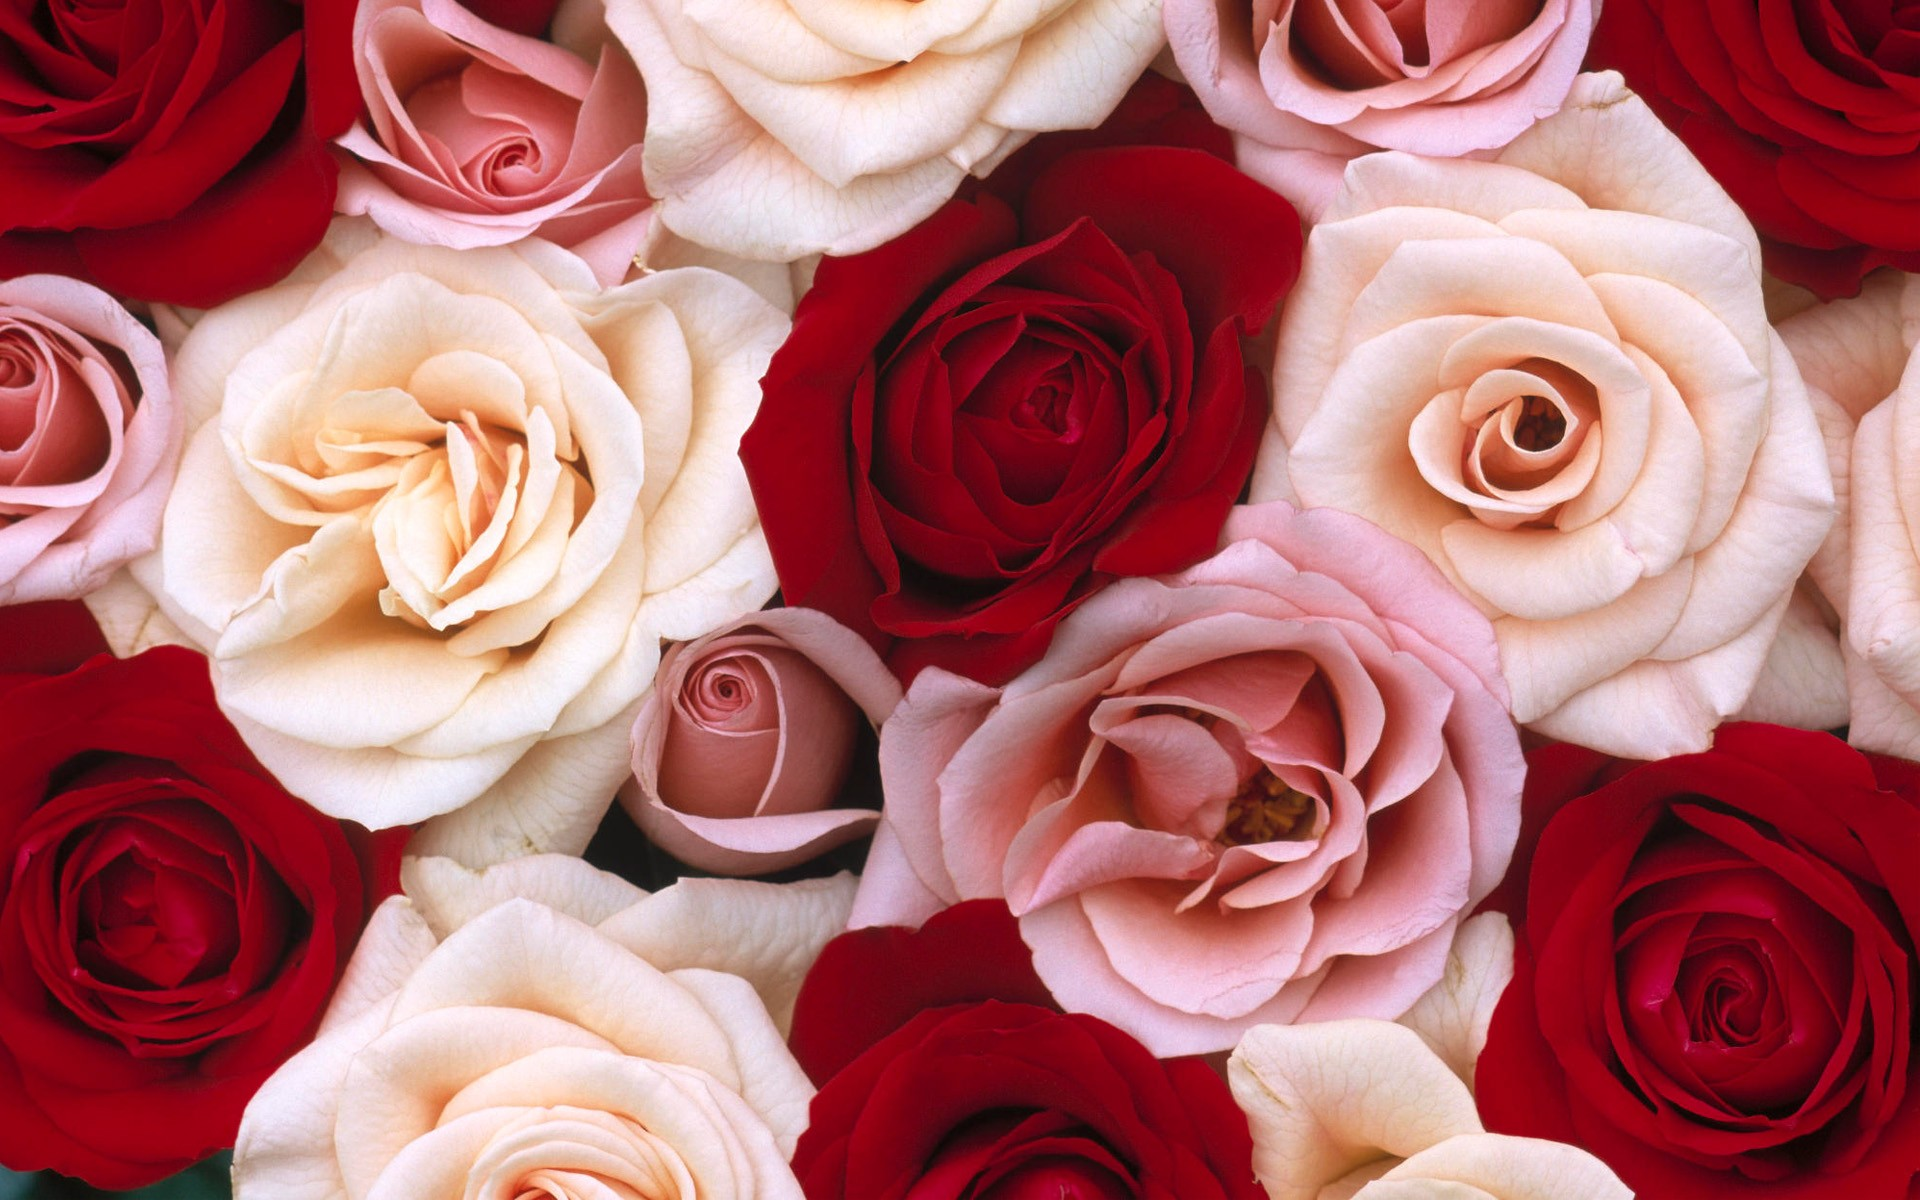 pink rose hd wallpaper for mobile